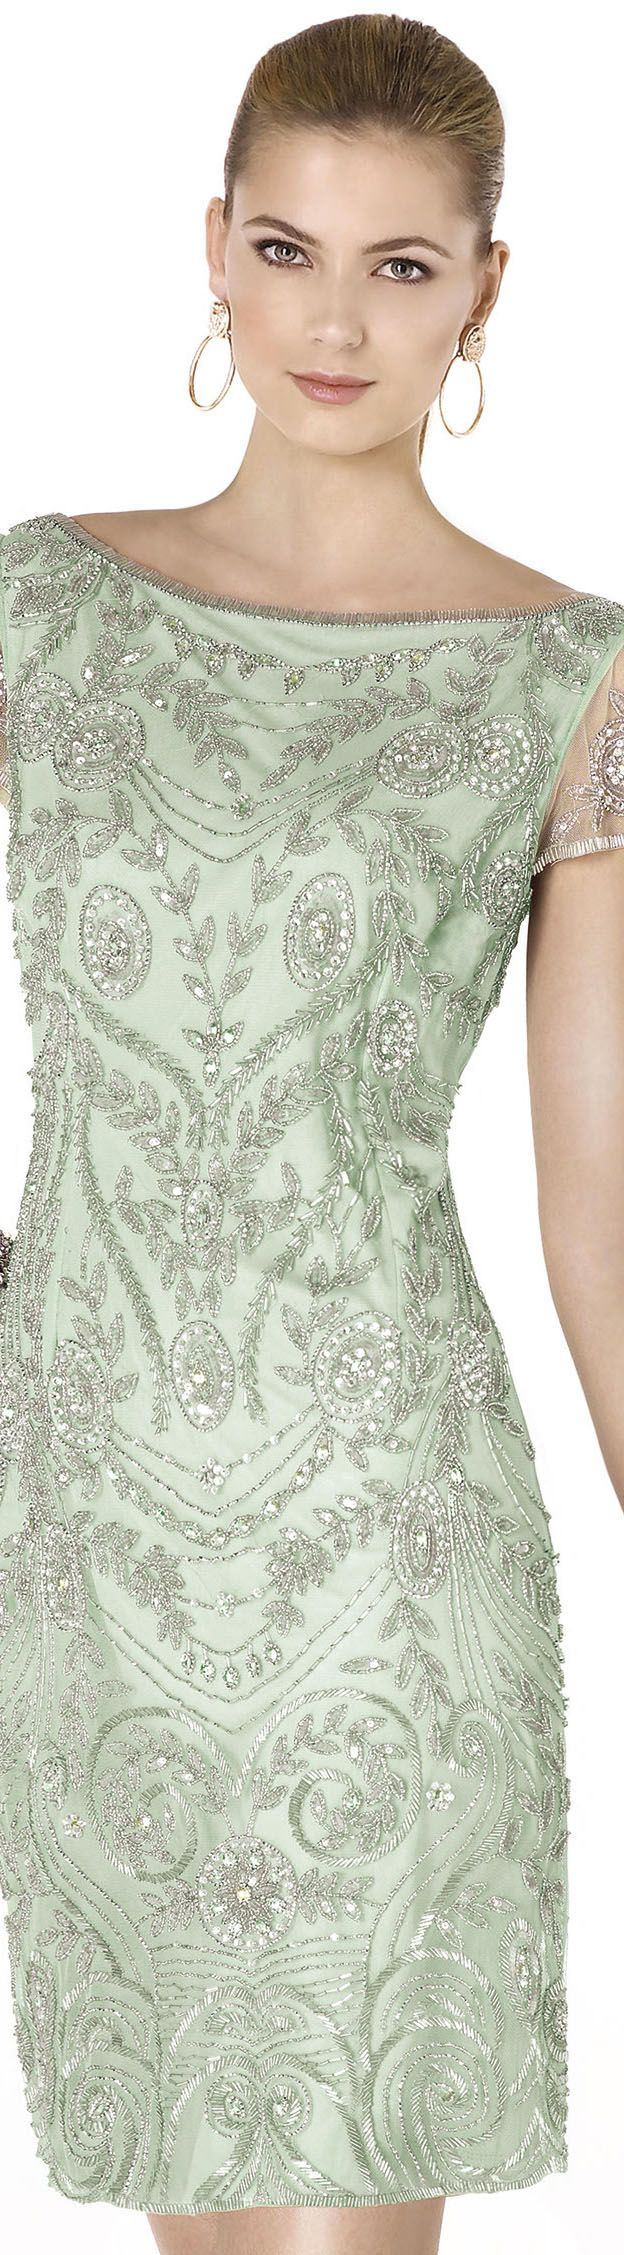 Pronovias 2015 Cocktail Dress Collection  jaglady